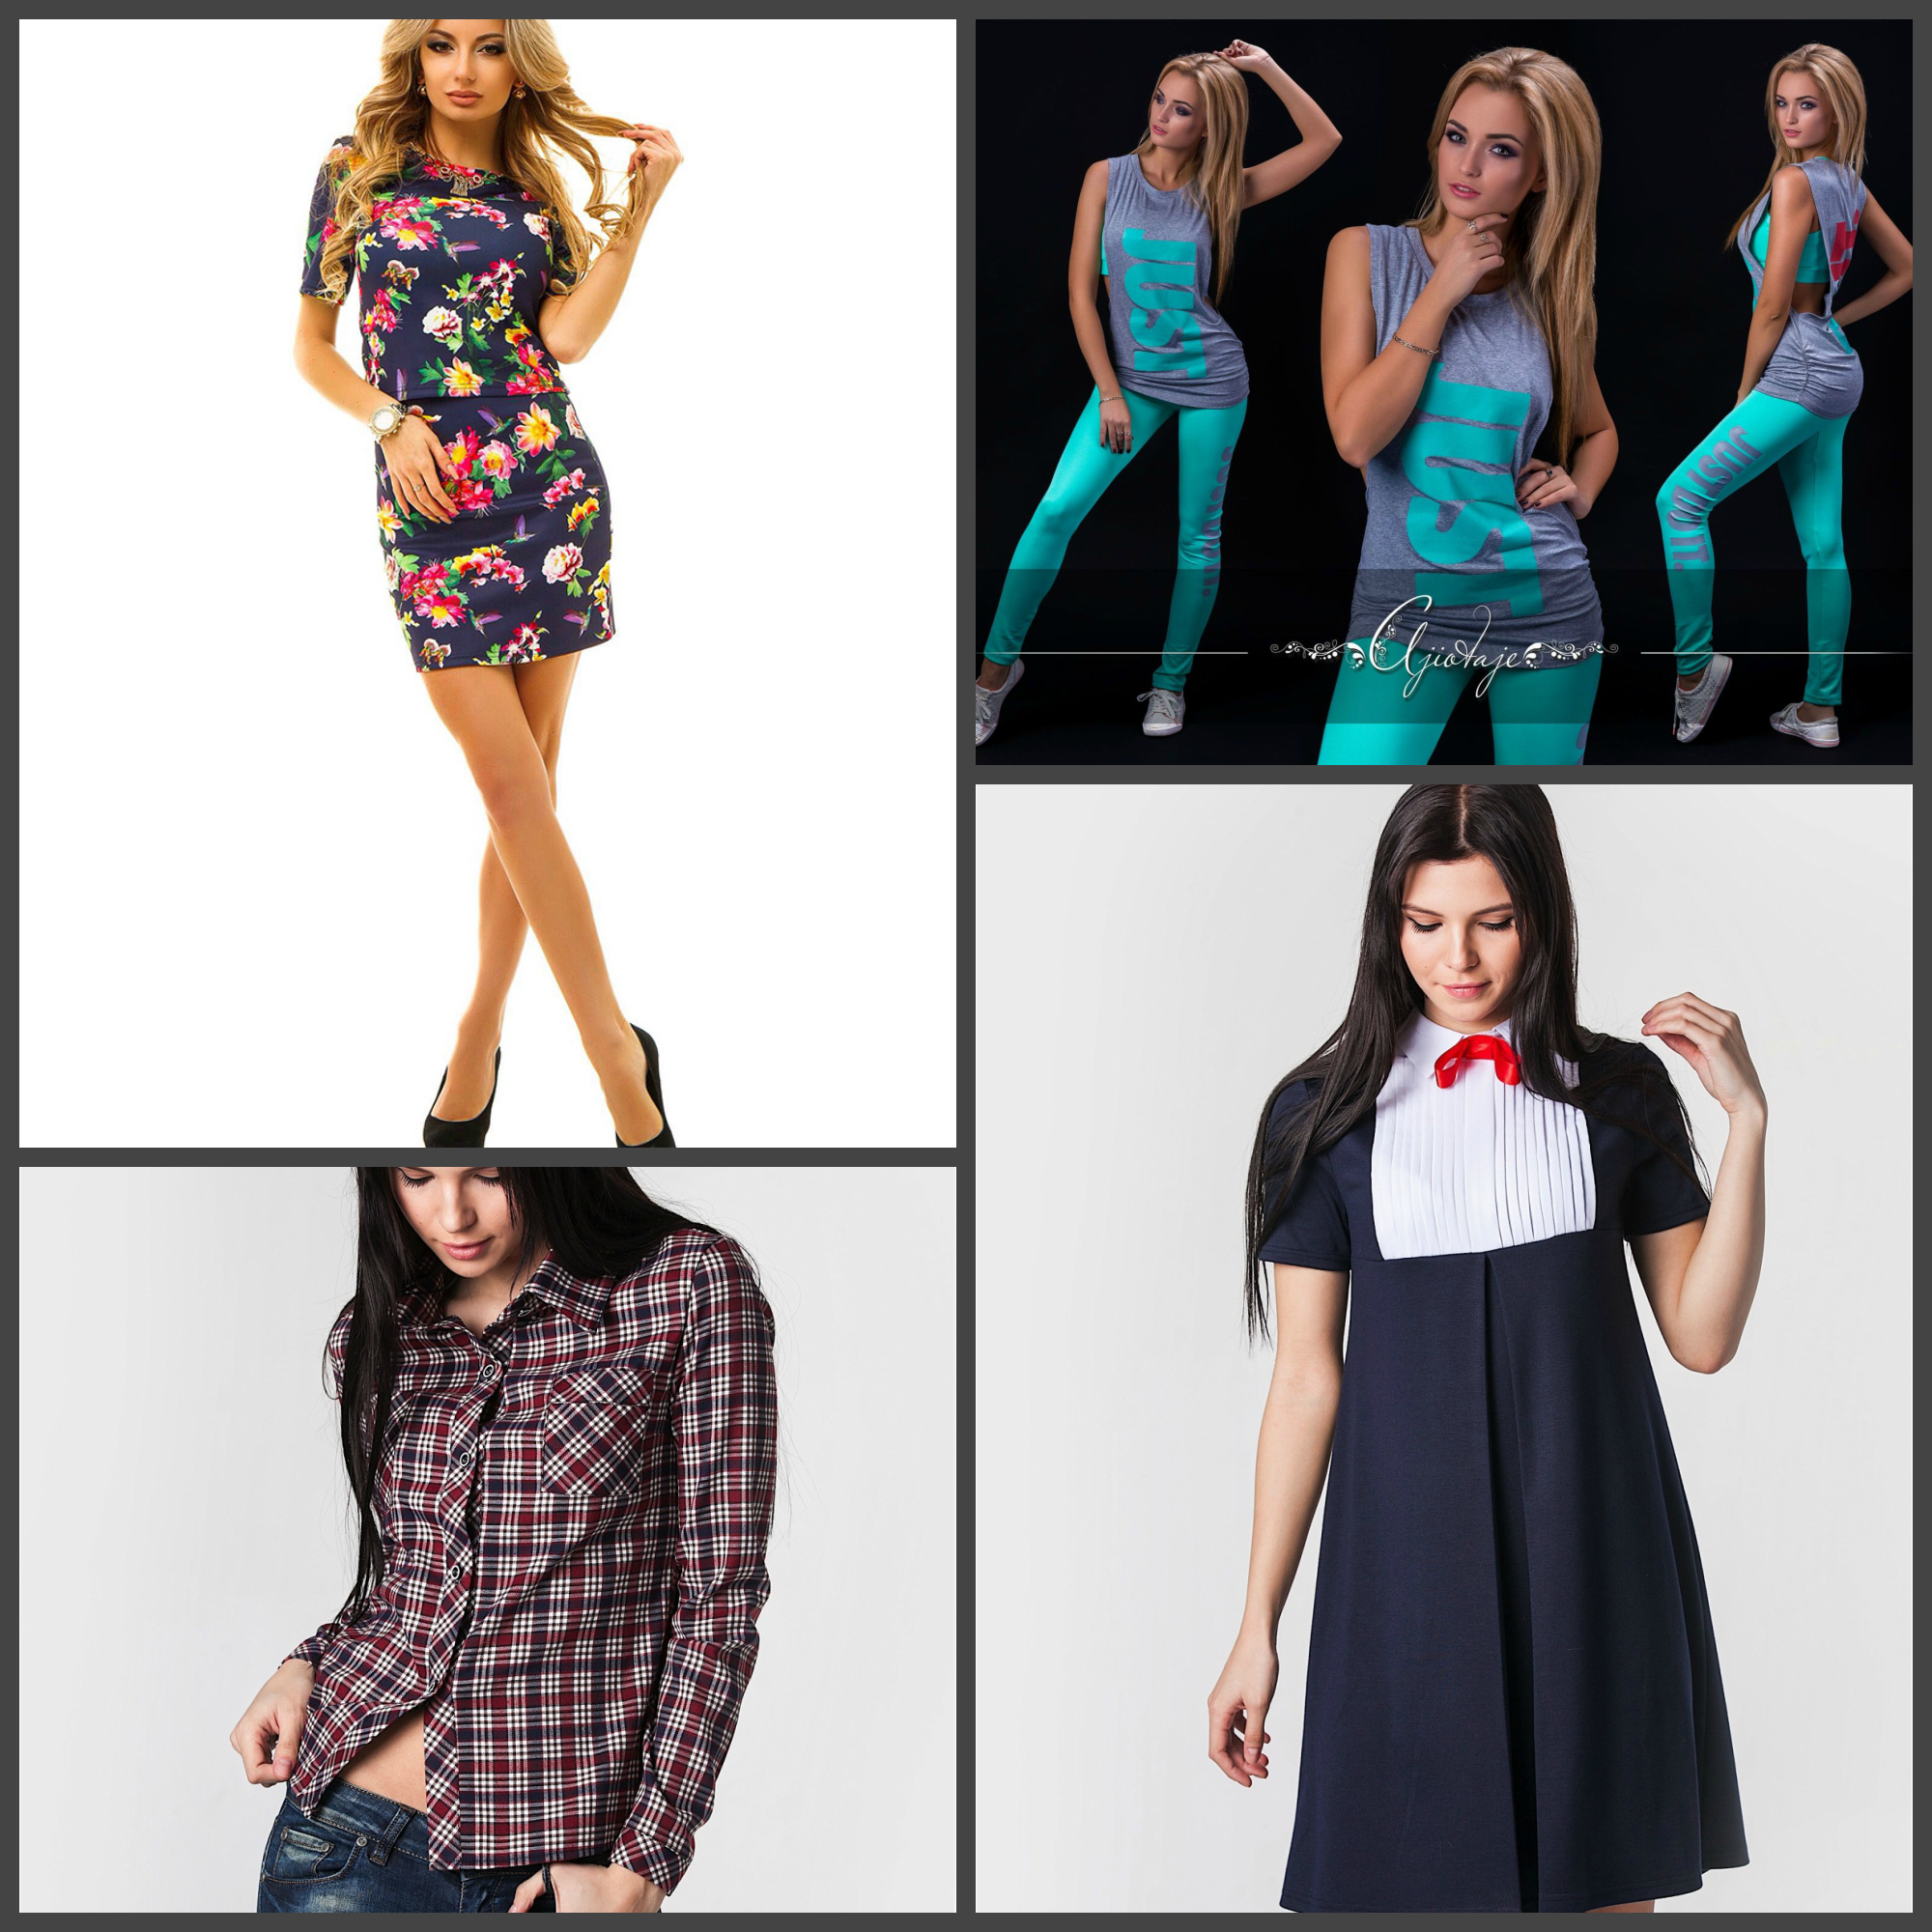 НОВИНКИ: платья, рубашки, блузки, спорт.одежда,лосины.